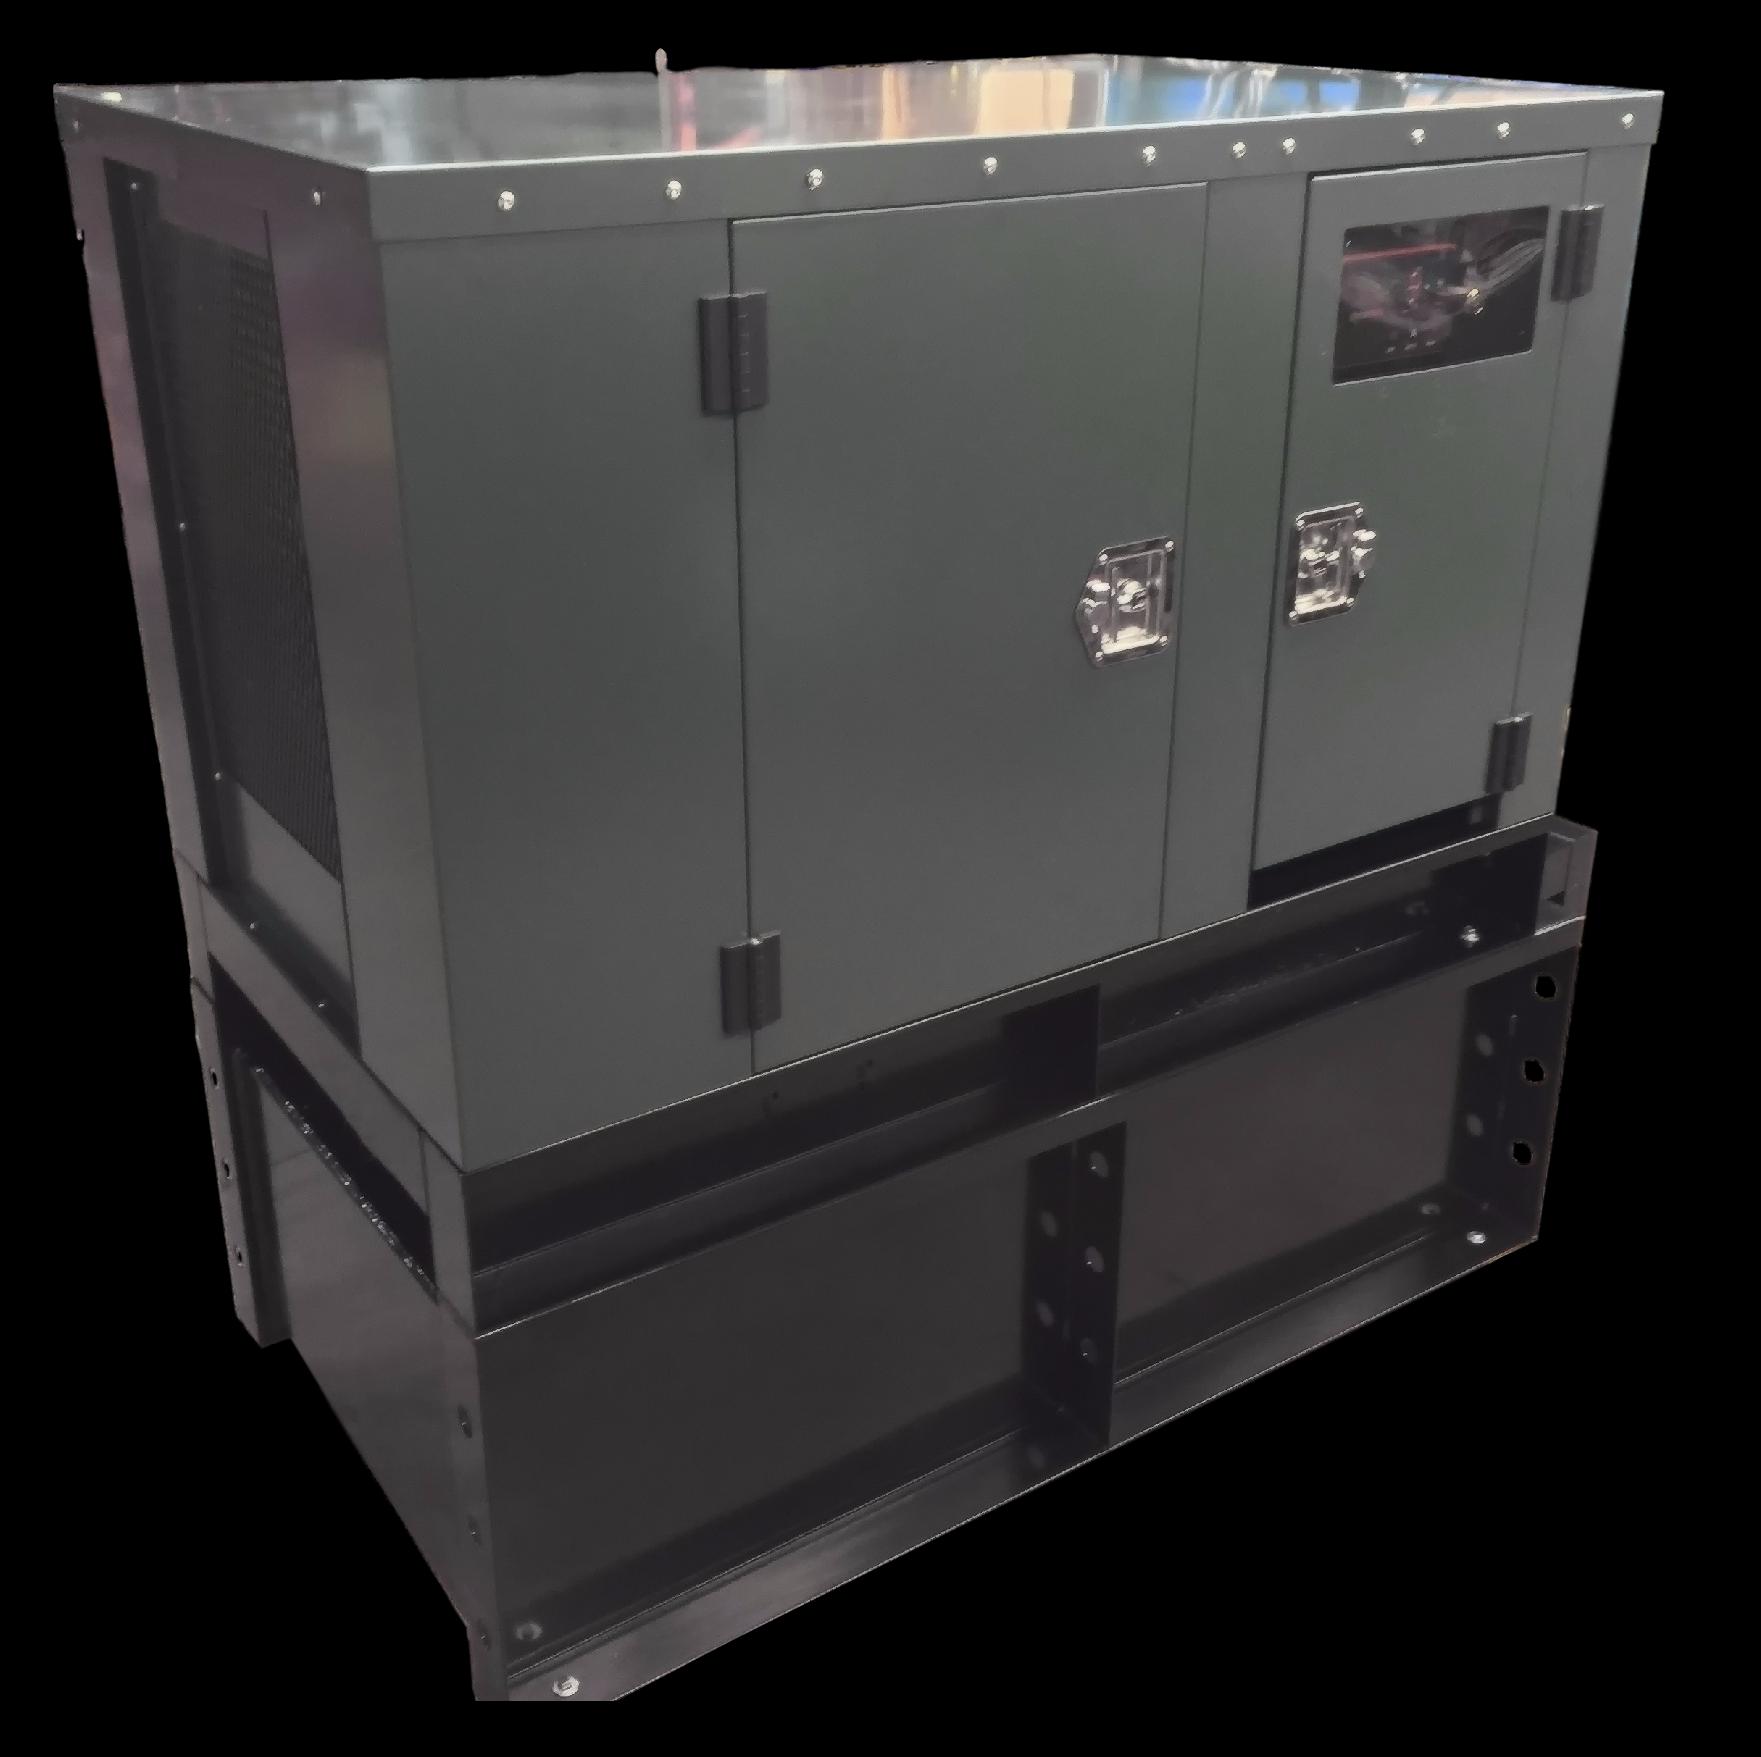 100 Gallon Generator Fuel Tank